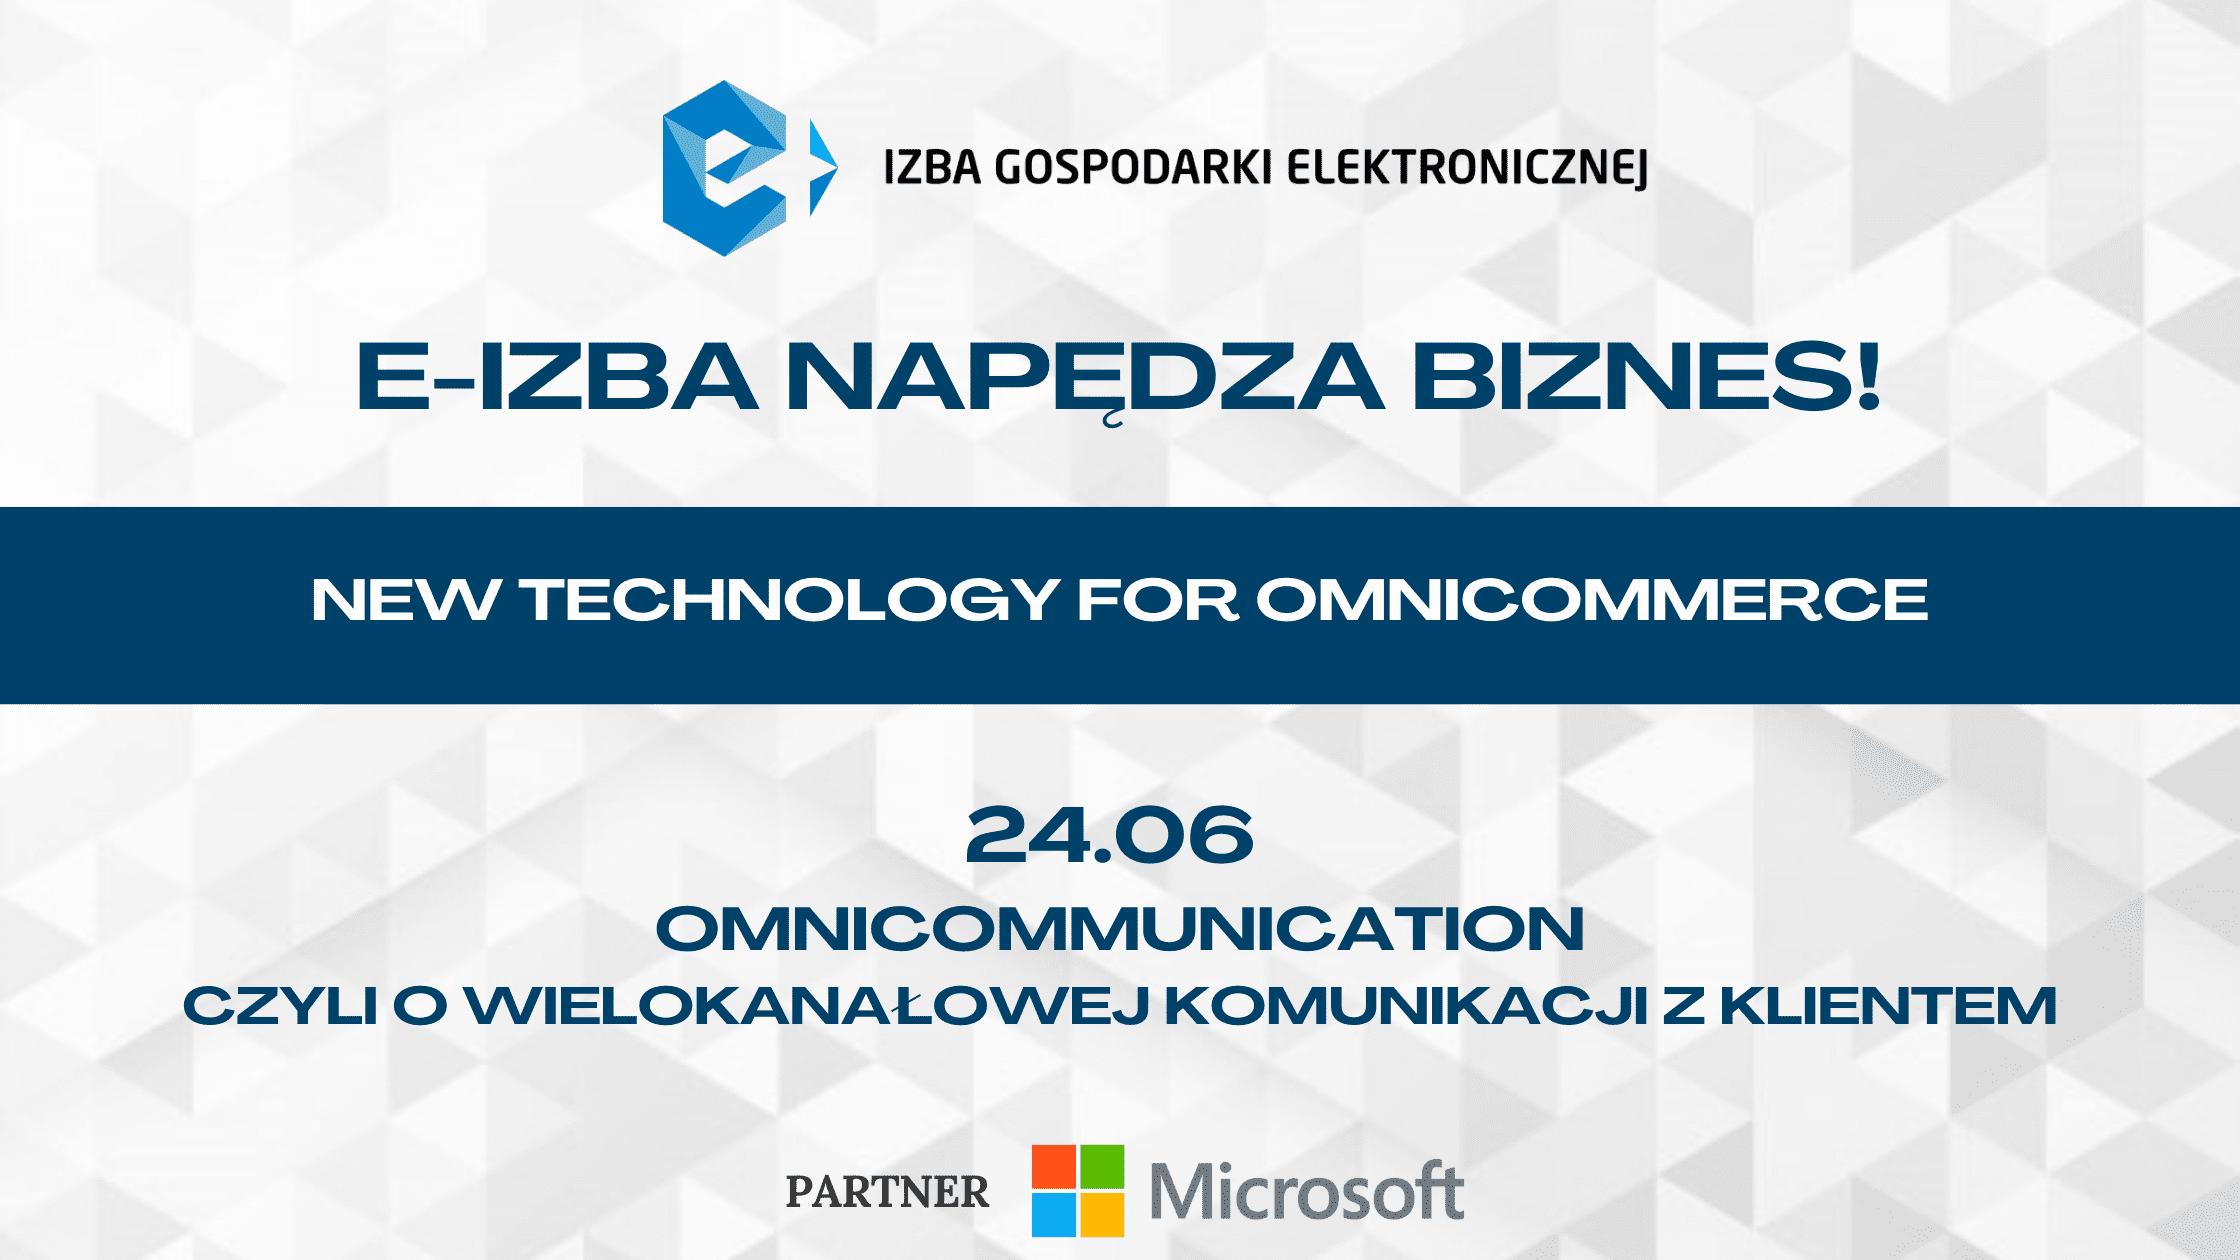 Drugie spotkanie New Technology for Omnicommerce już 24.06!